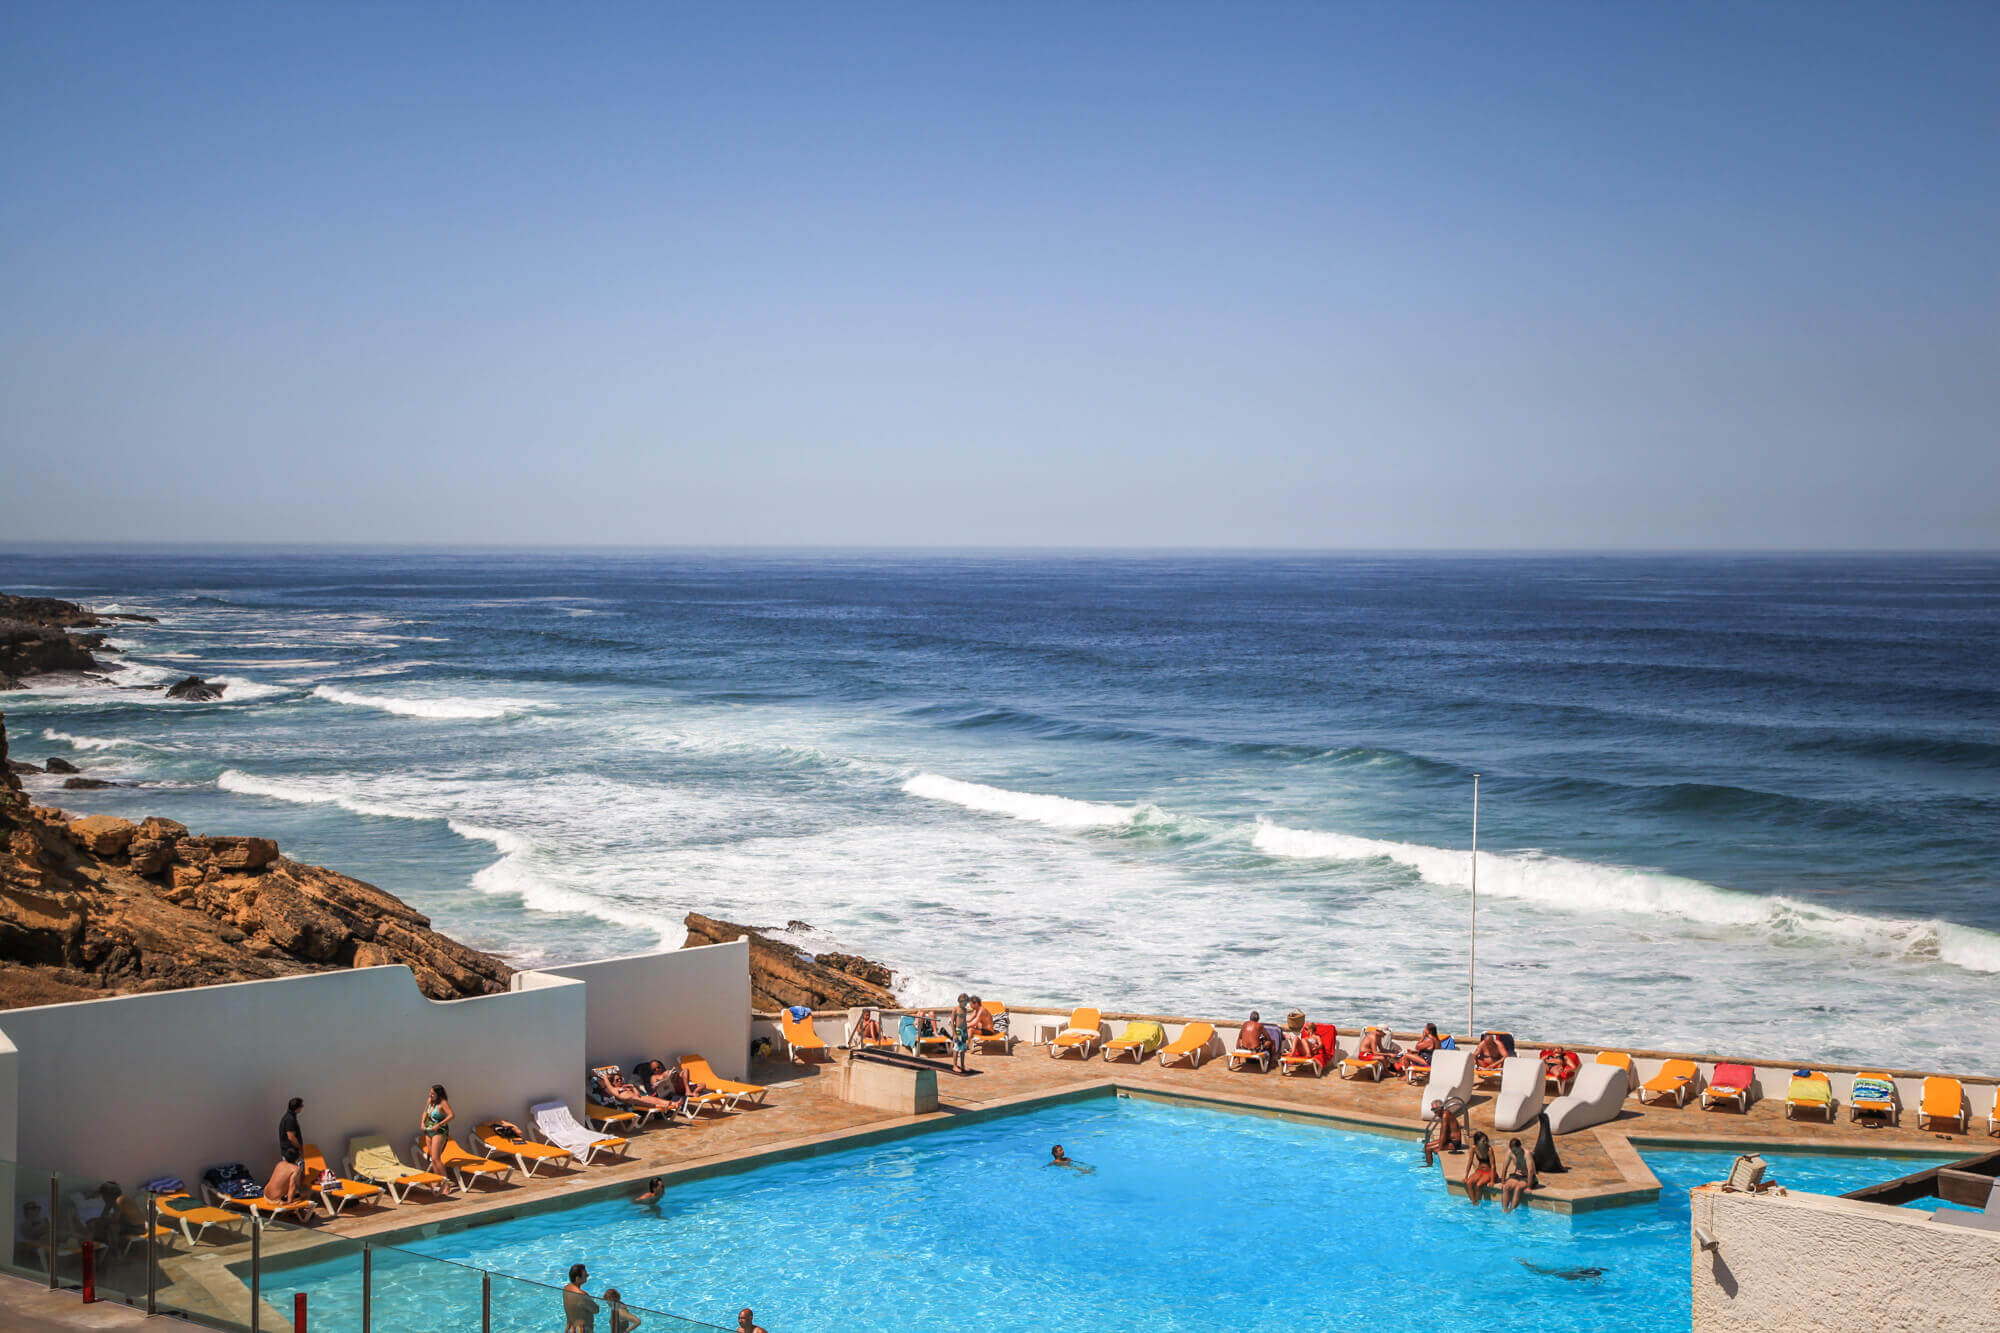 Praia do Guincho pool